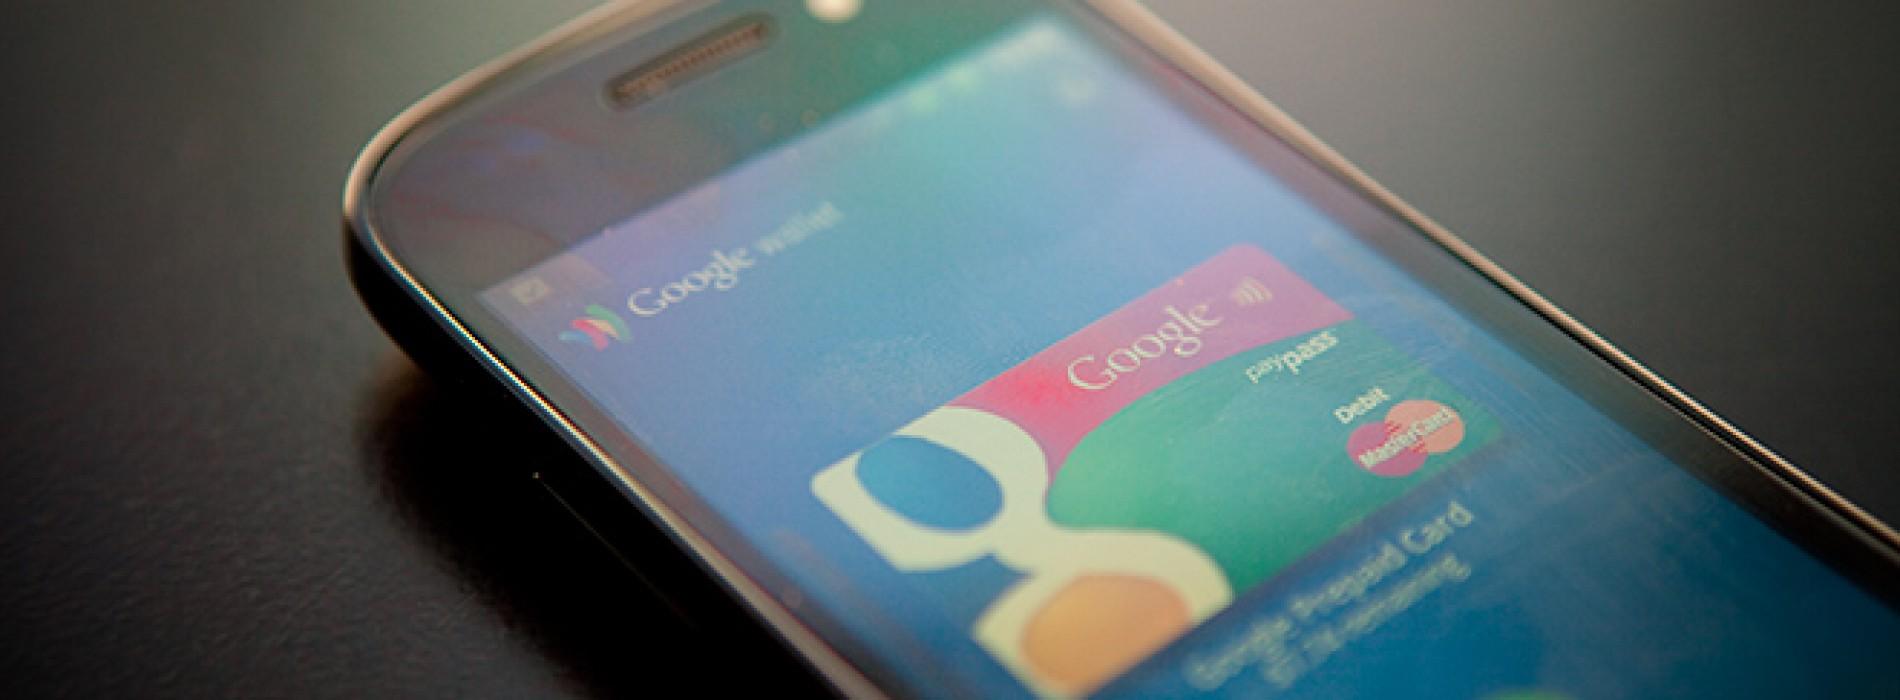 Google brings Google Wallet to mobile websites